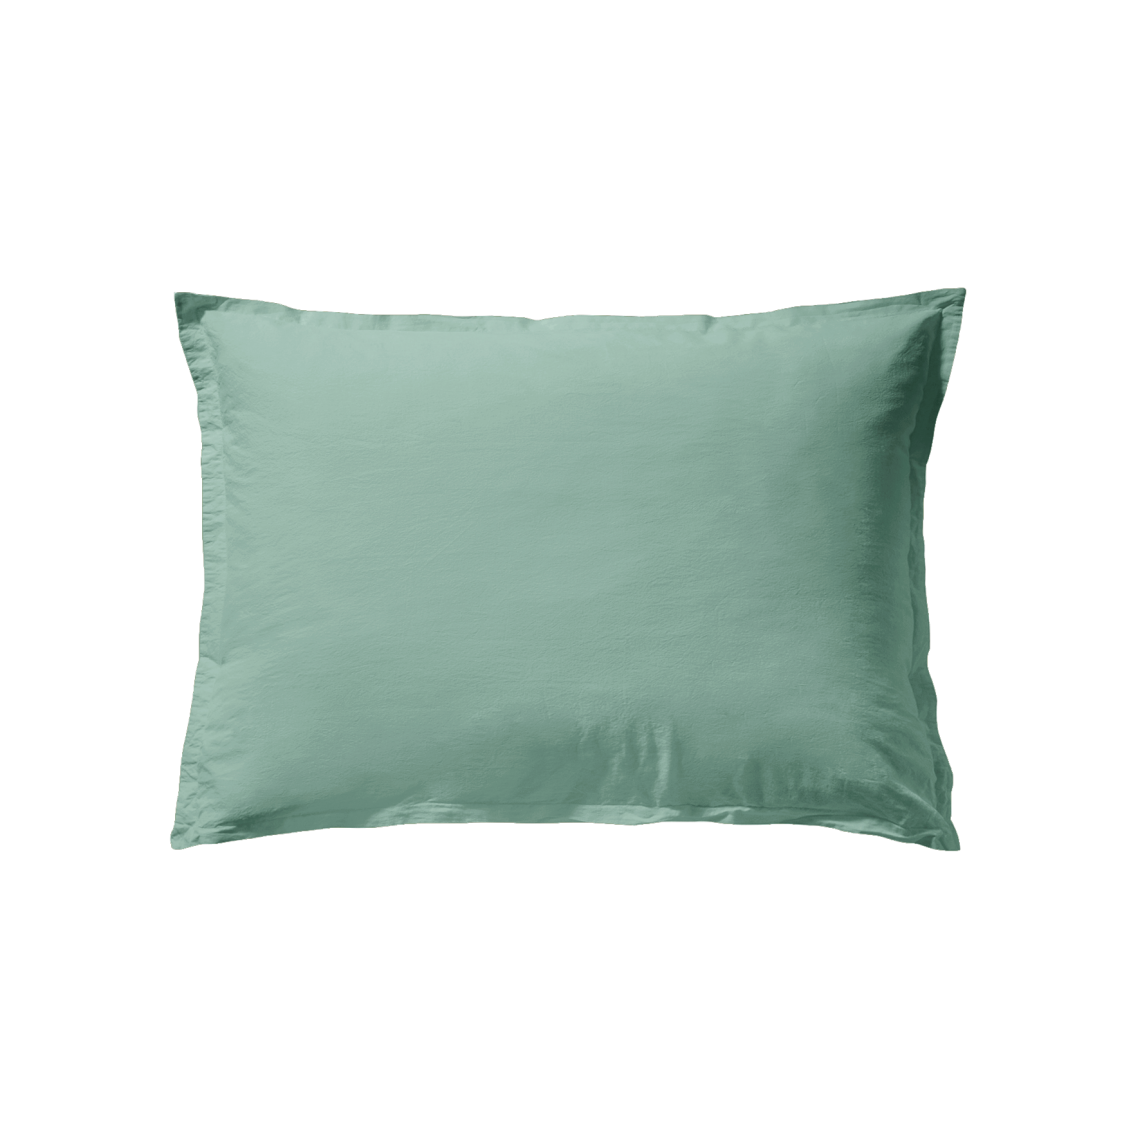 soft-line-vert-fumee-1230783-1_1140x1140